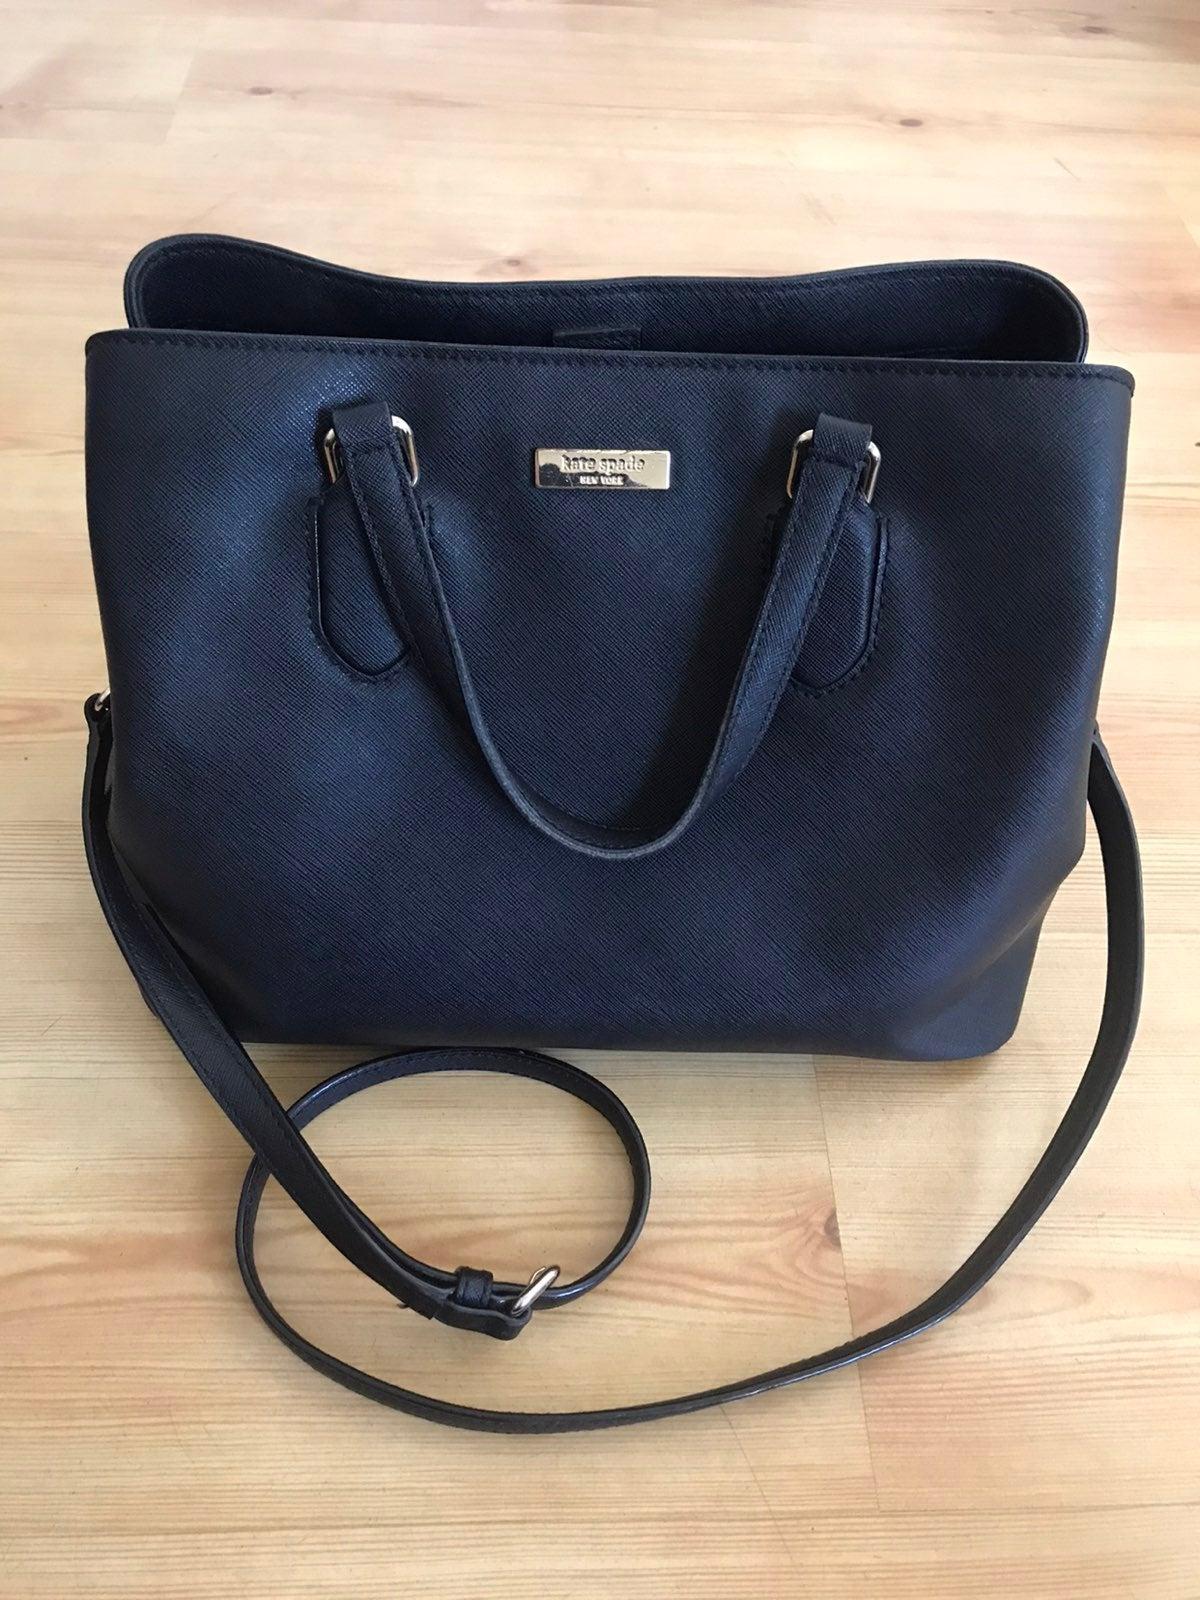 Kate spade New York Bag/Handbag